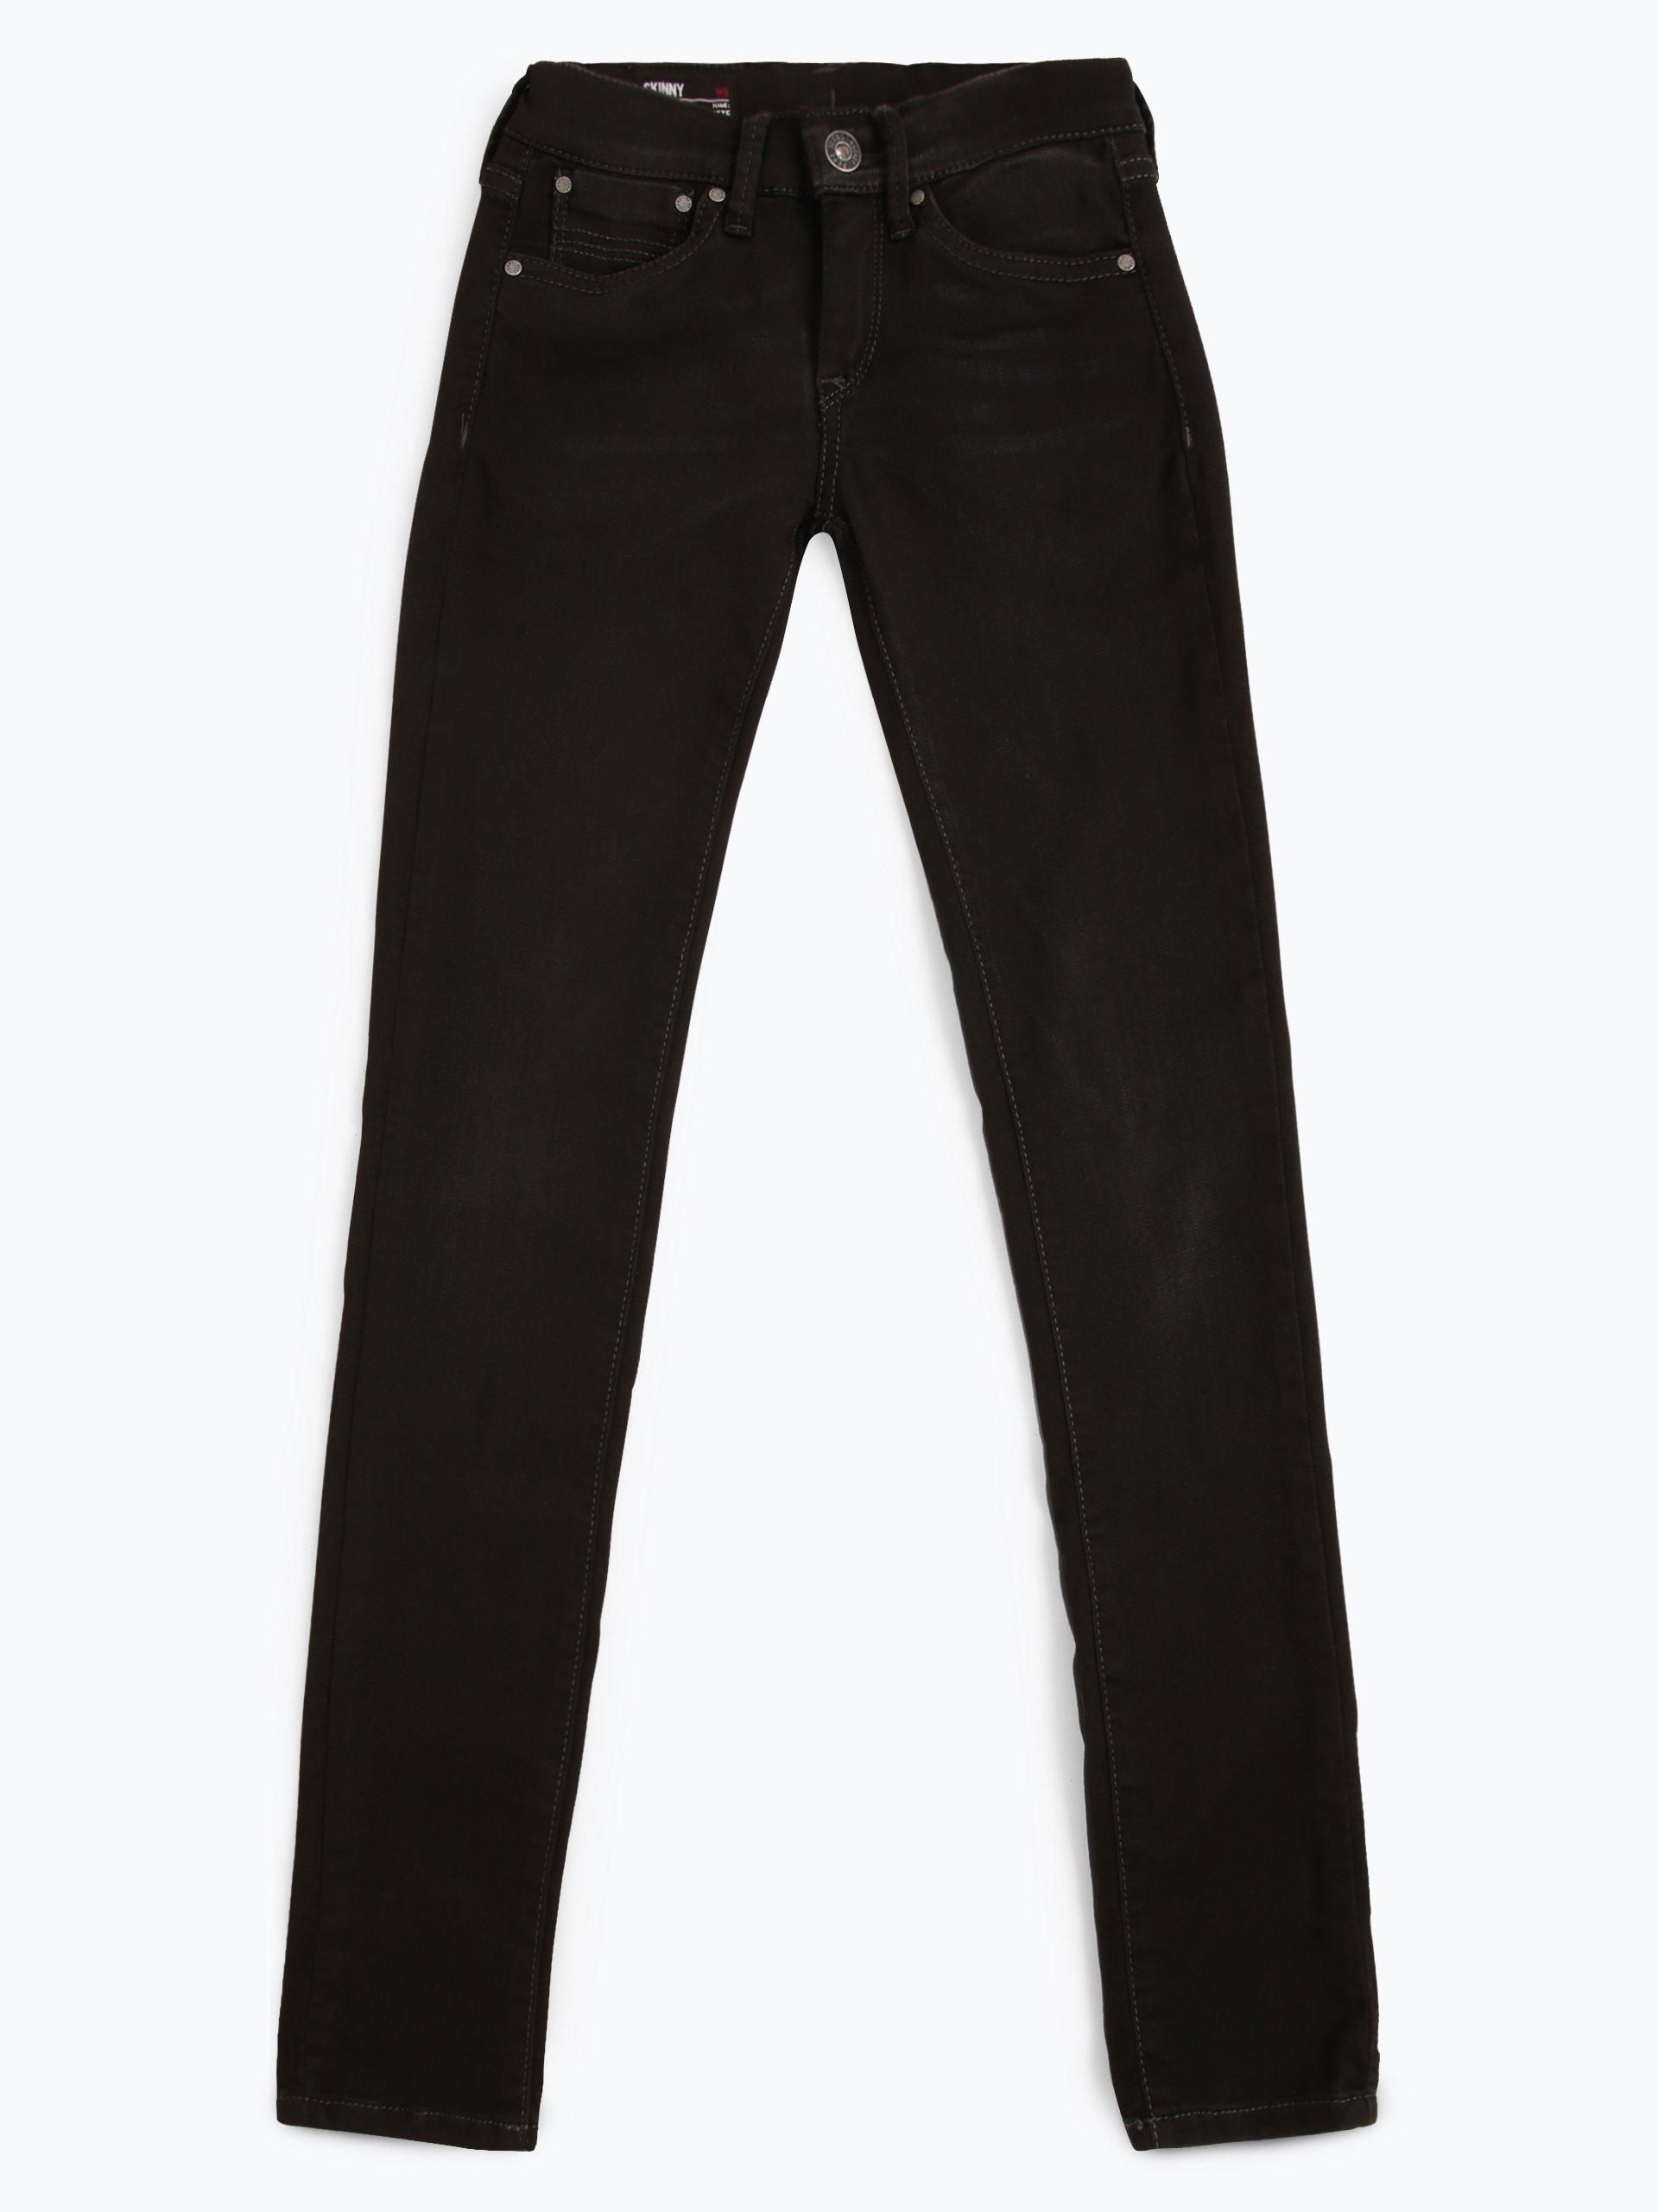 Pepe Jeans Mädchen Jeans Skinny Fit - Pixlette